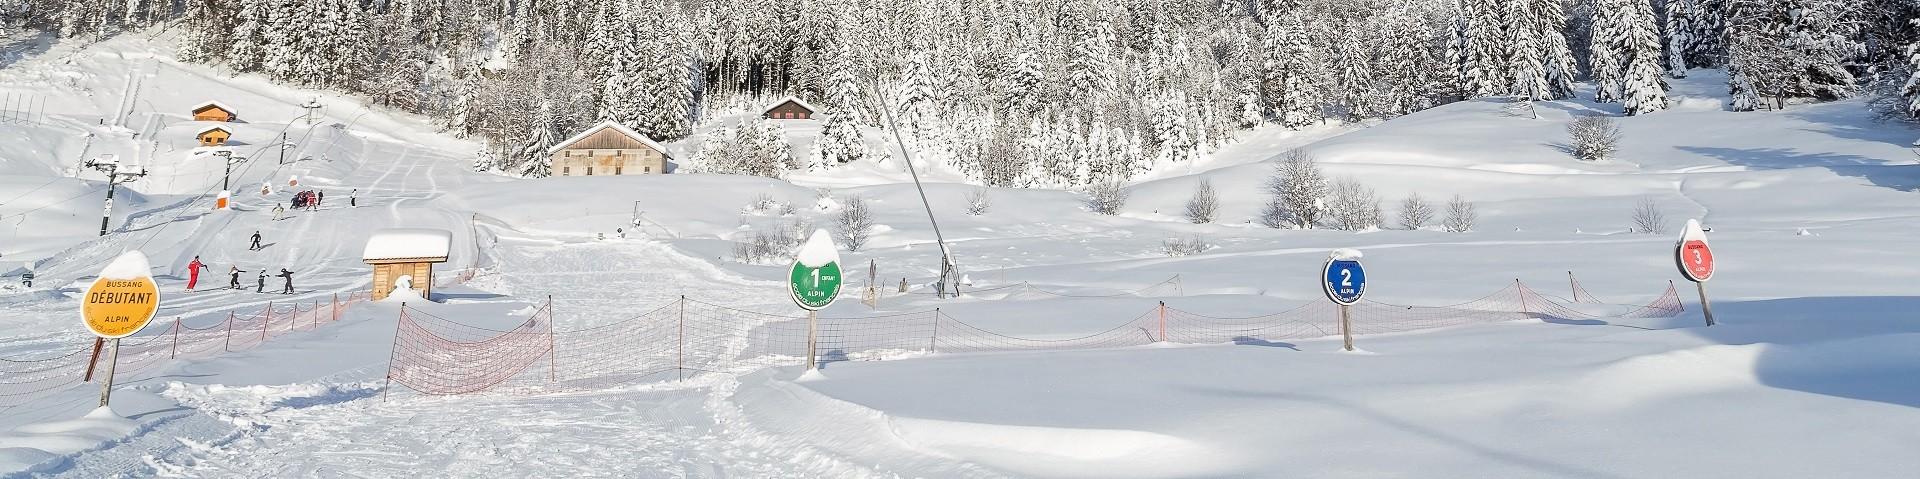 dominique-steinel-neige285-001-5-jpg-larcenaire-2130